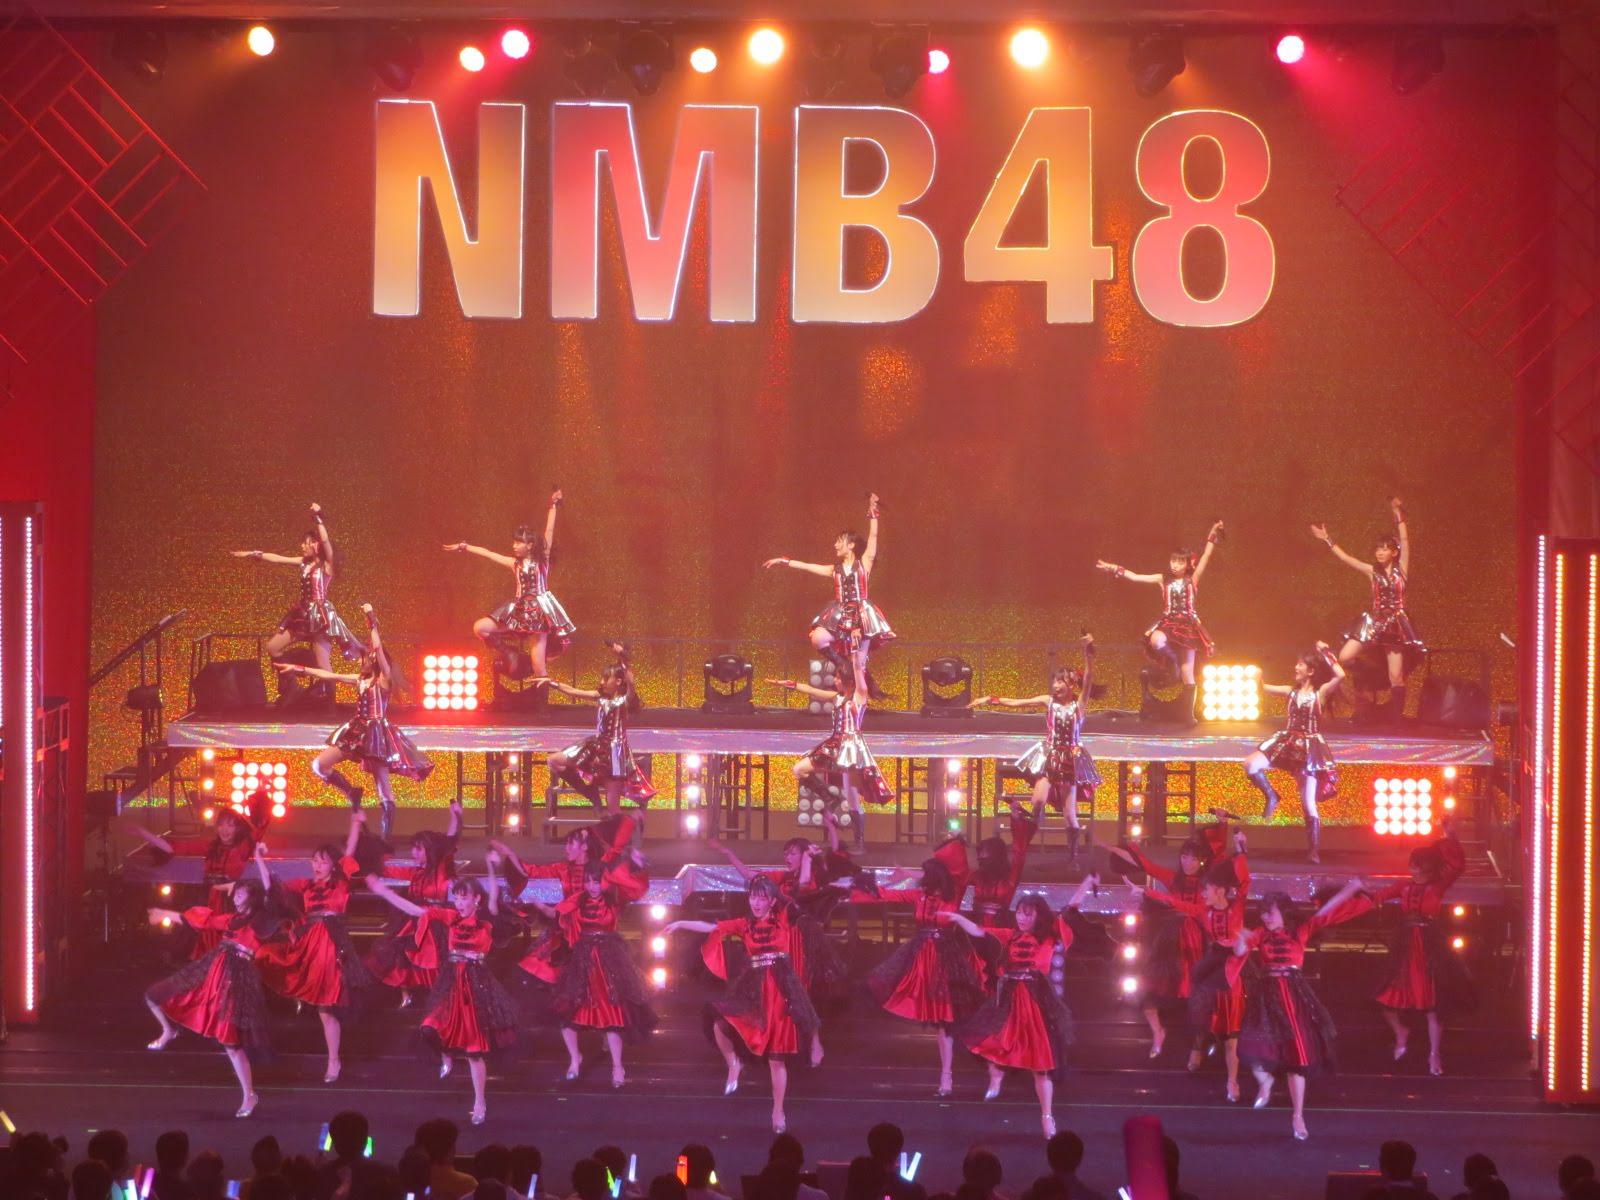 【NMB48】研究生出演・NMB48近畿十番勝負2019 @貝塚市民文化会館コスモシアターのセットリストと金子支配人Googleフォト投稿画像。